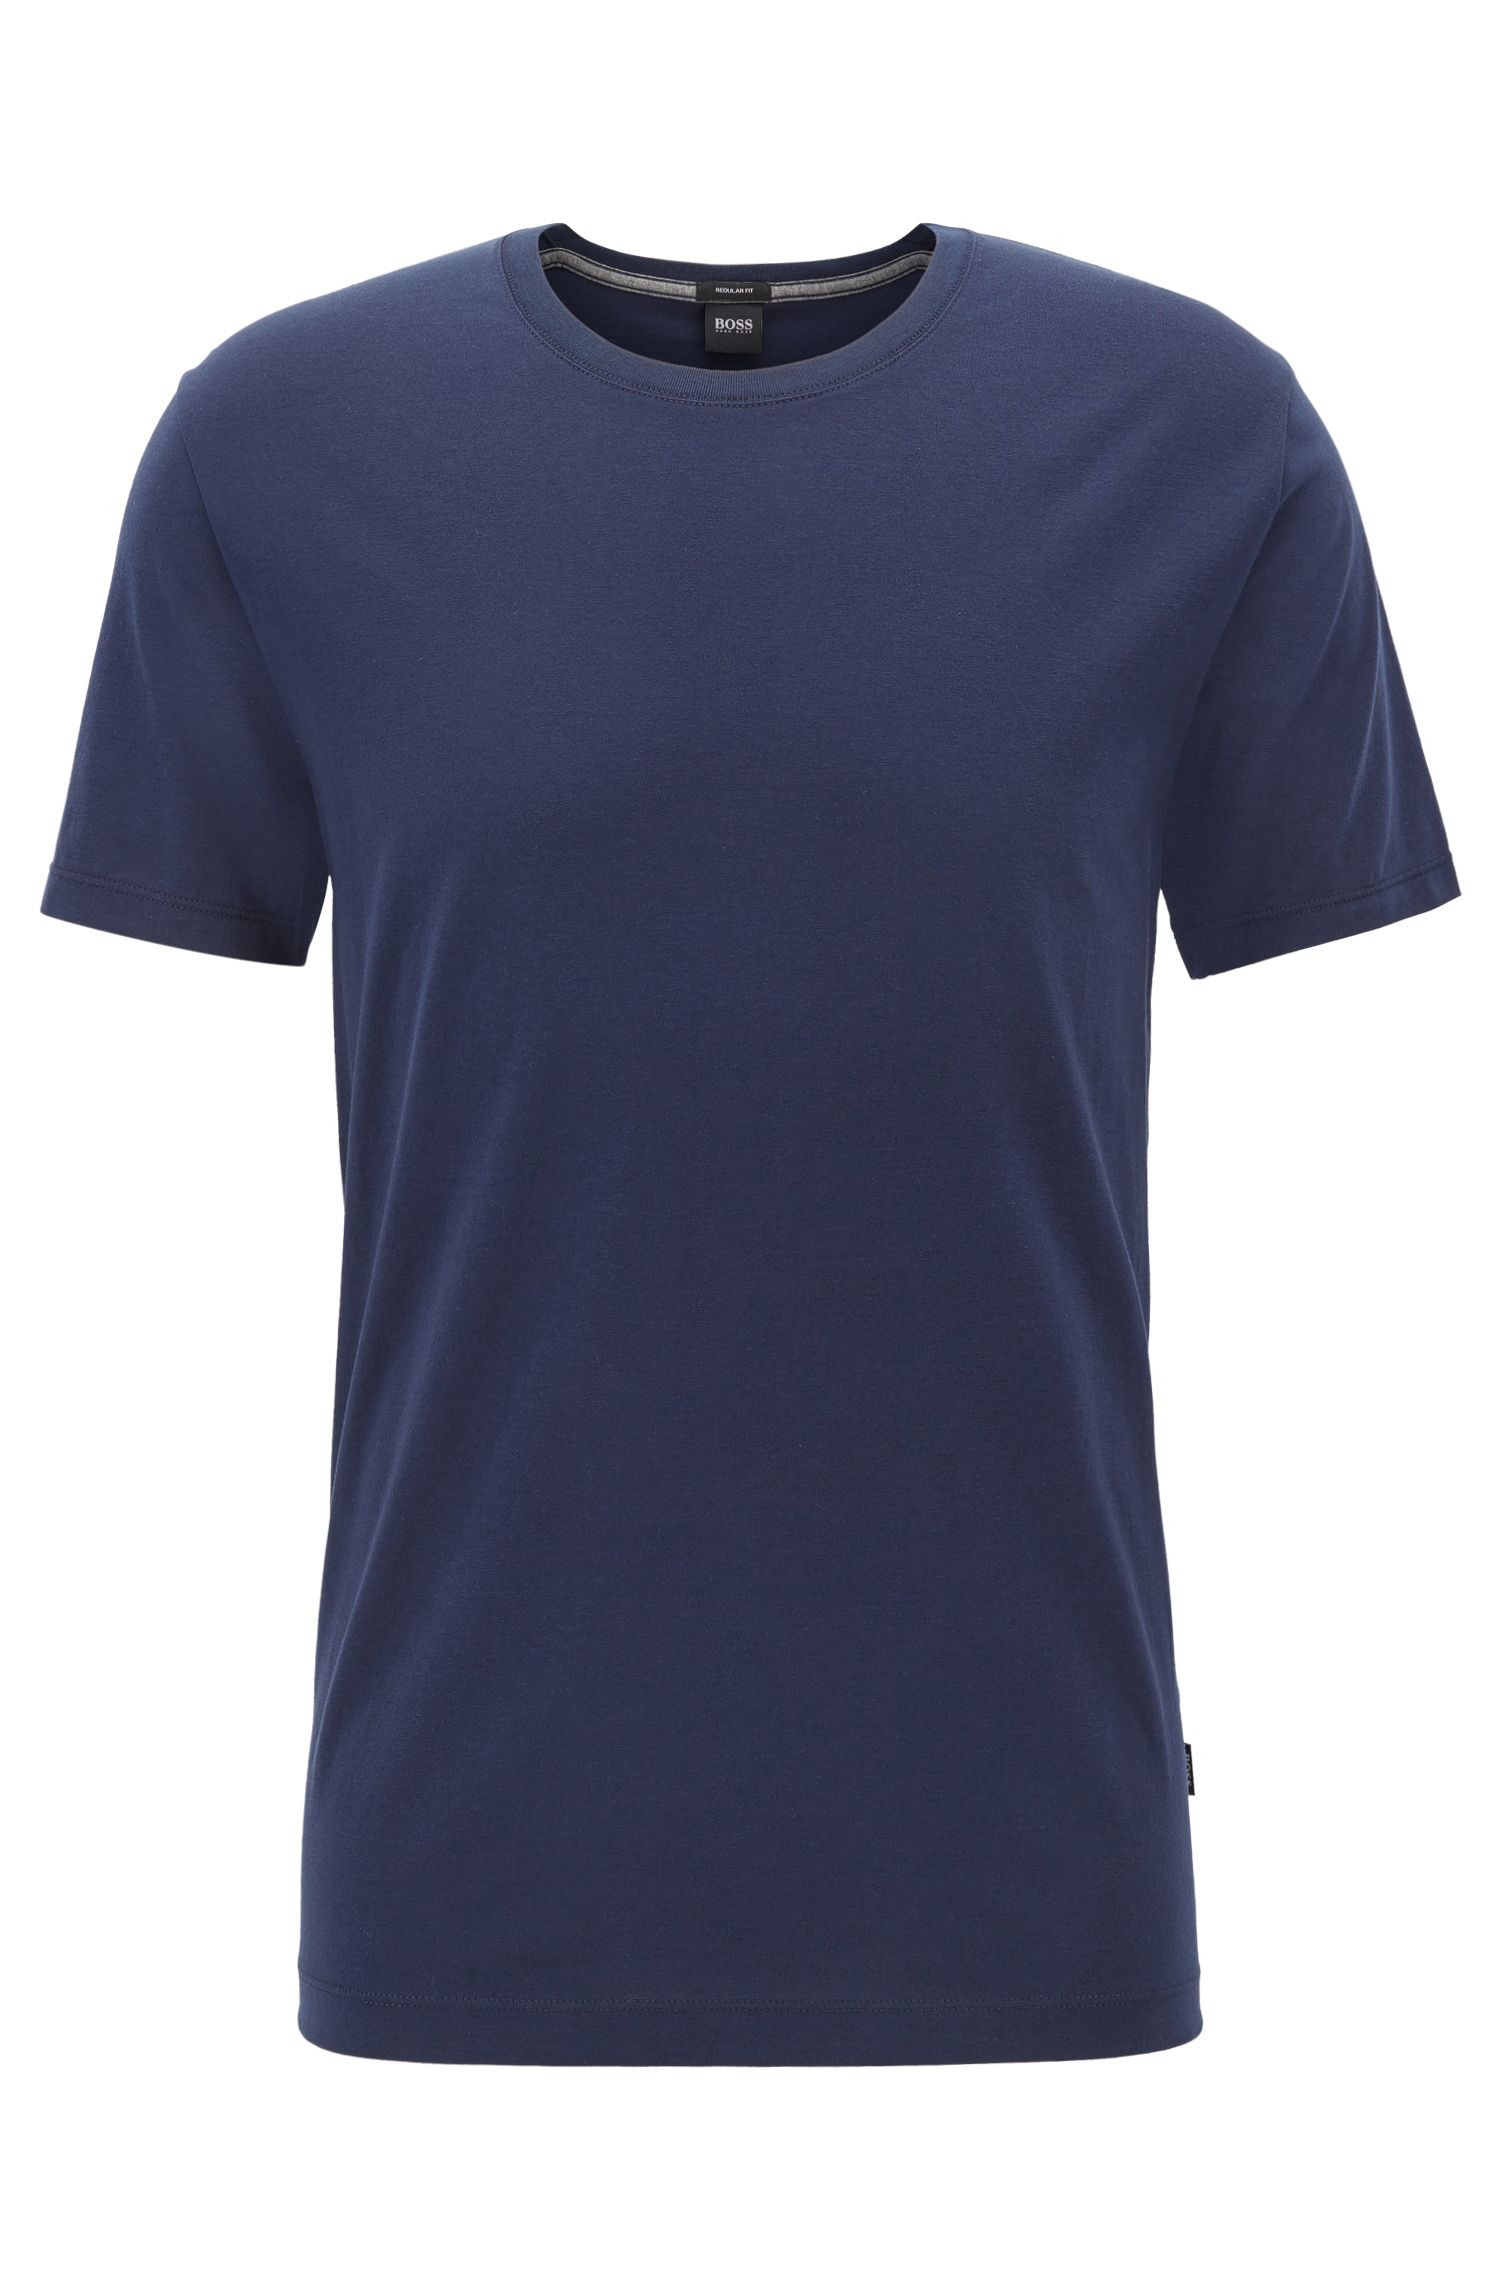 T-shirt regular fit in morbido cotone